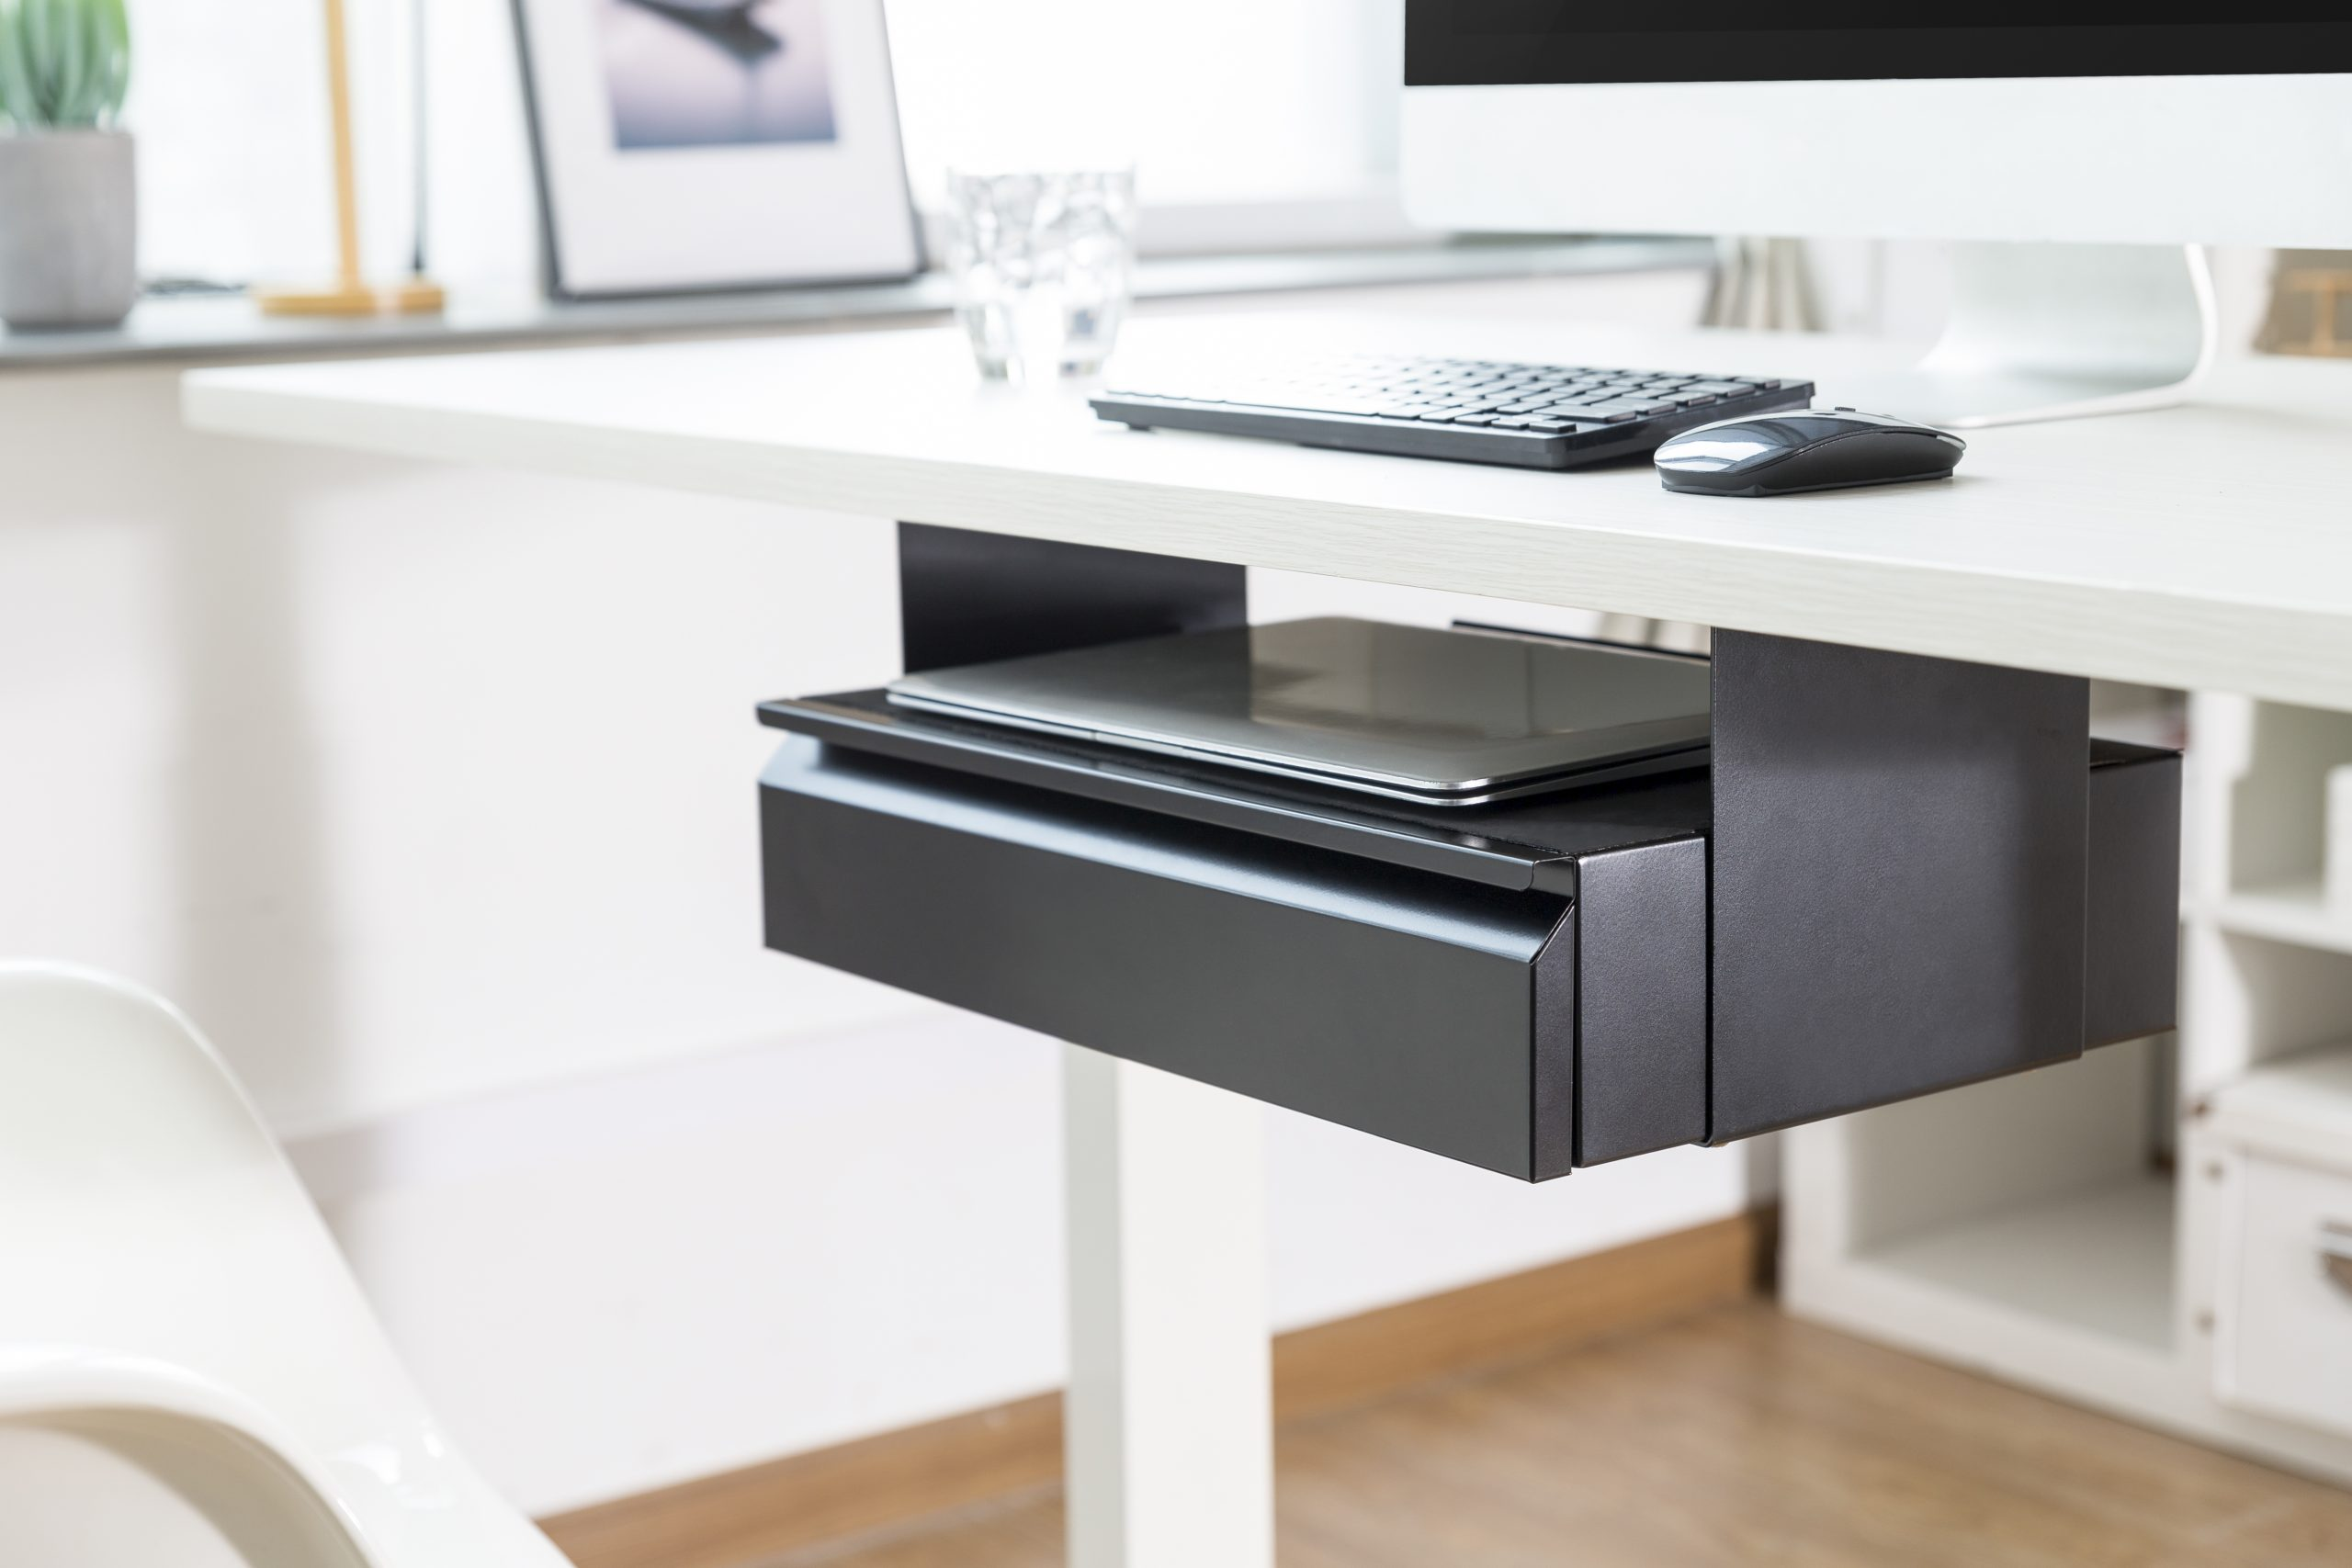 Allcam US022 Under-desk storage drawer & laptop shelf mounted